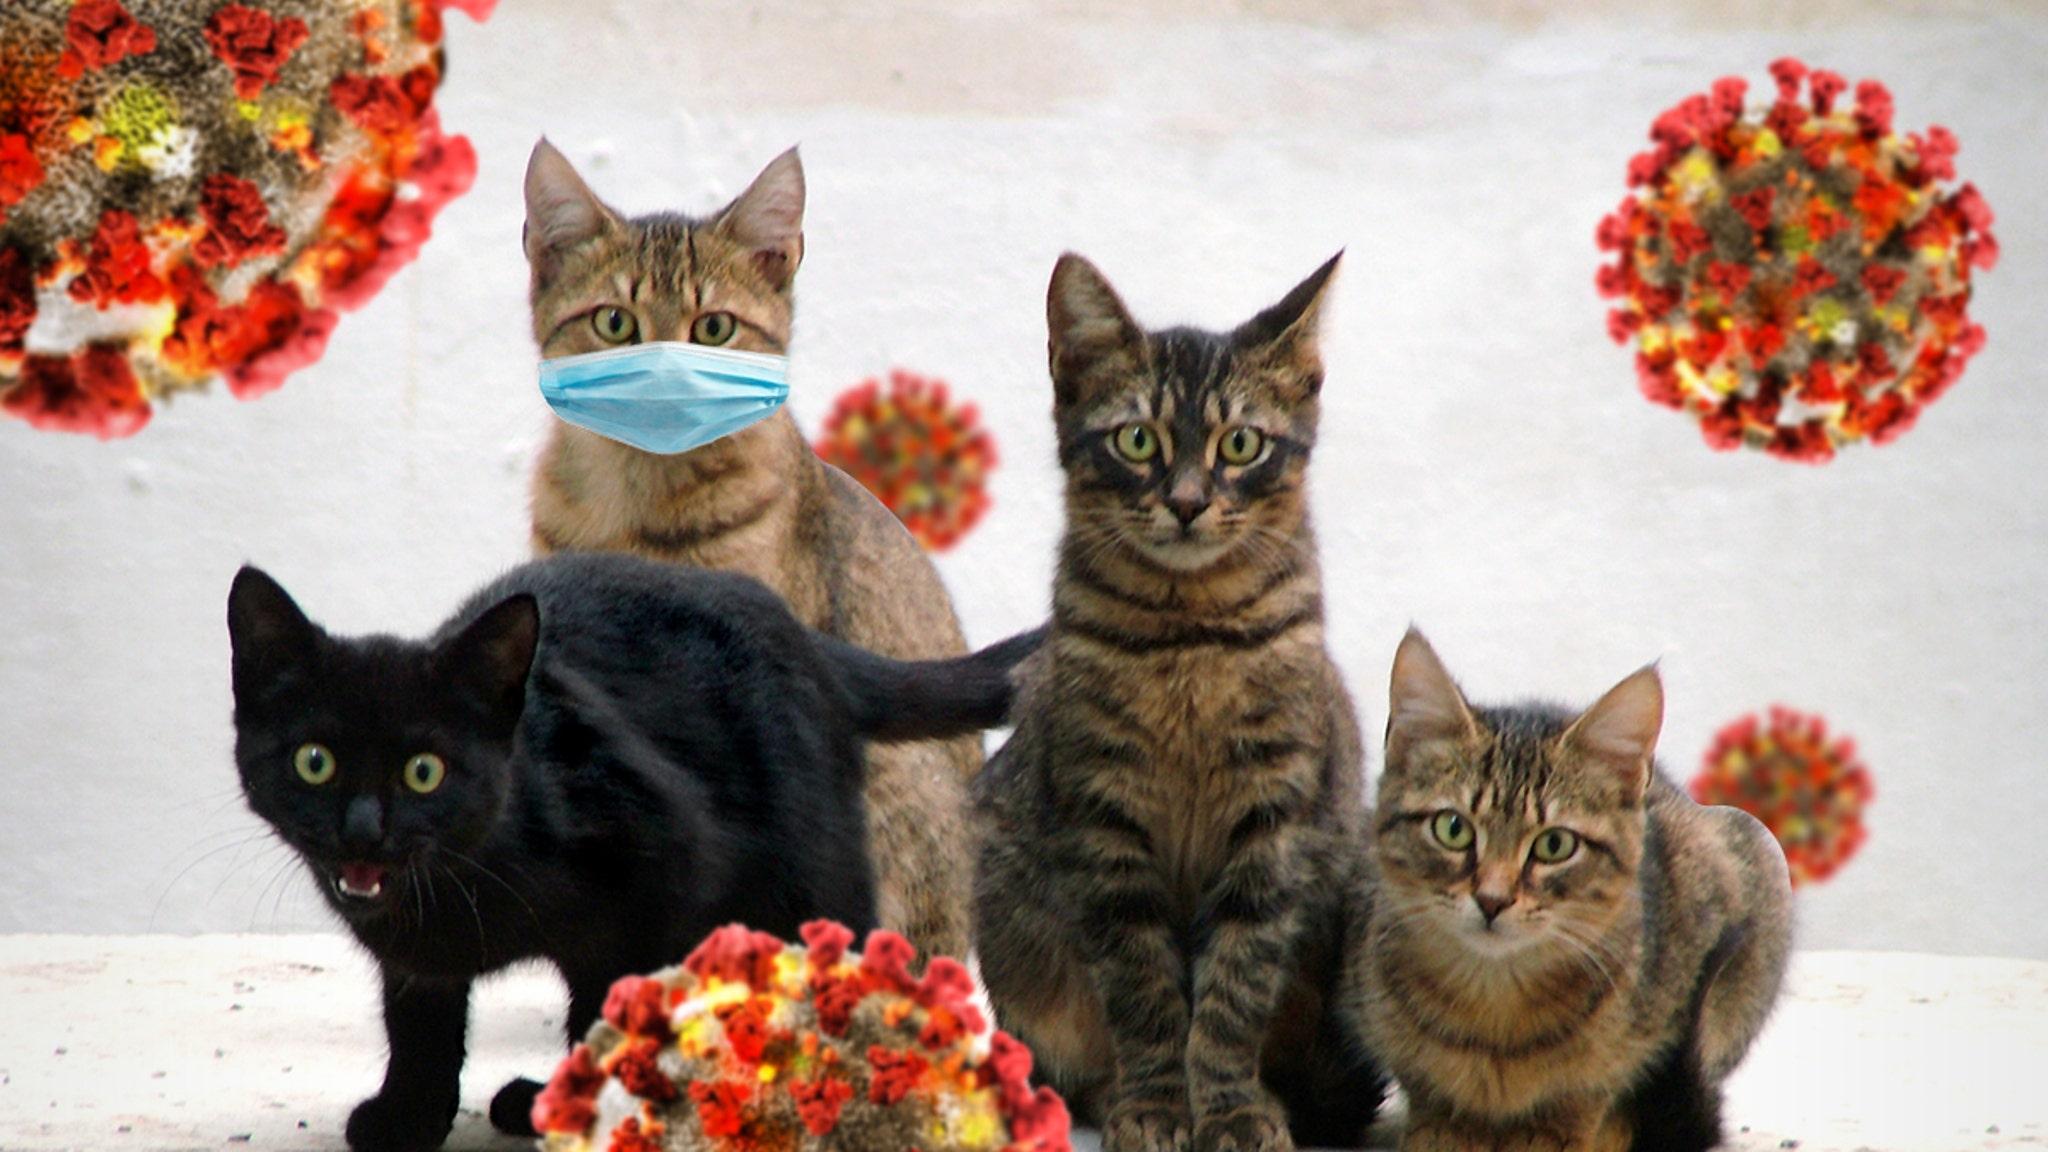 CORONAVIRUS TWO HOUSE CATS CATCH COVID-19 ... Not Feline Fine